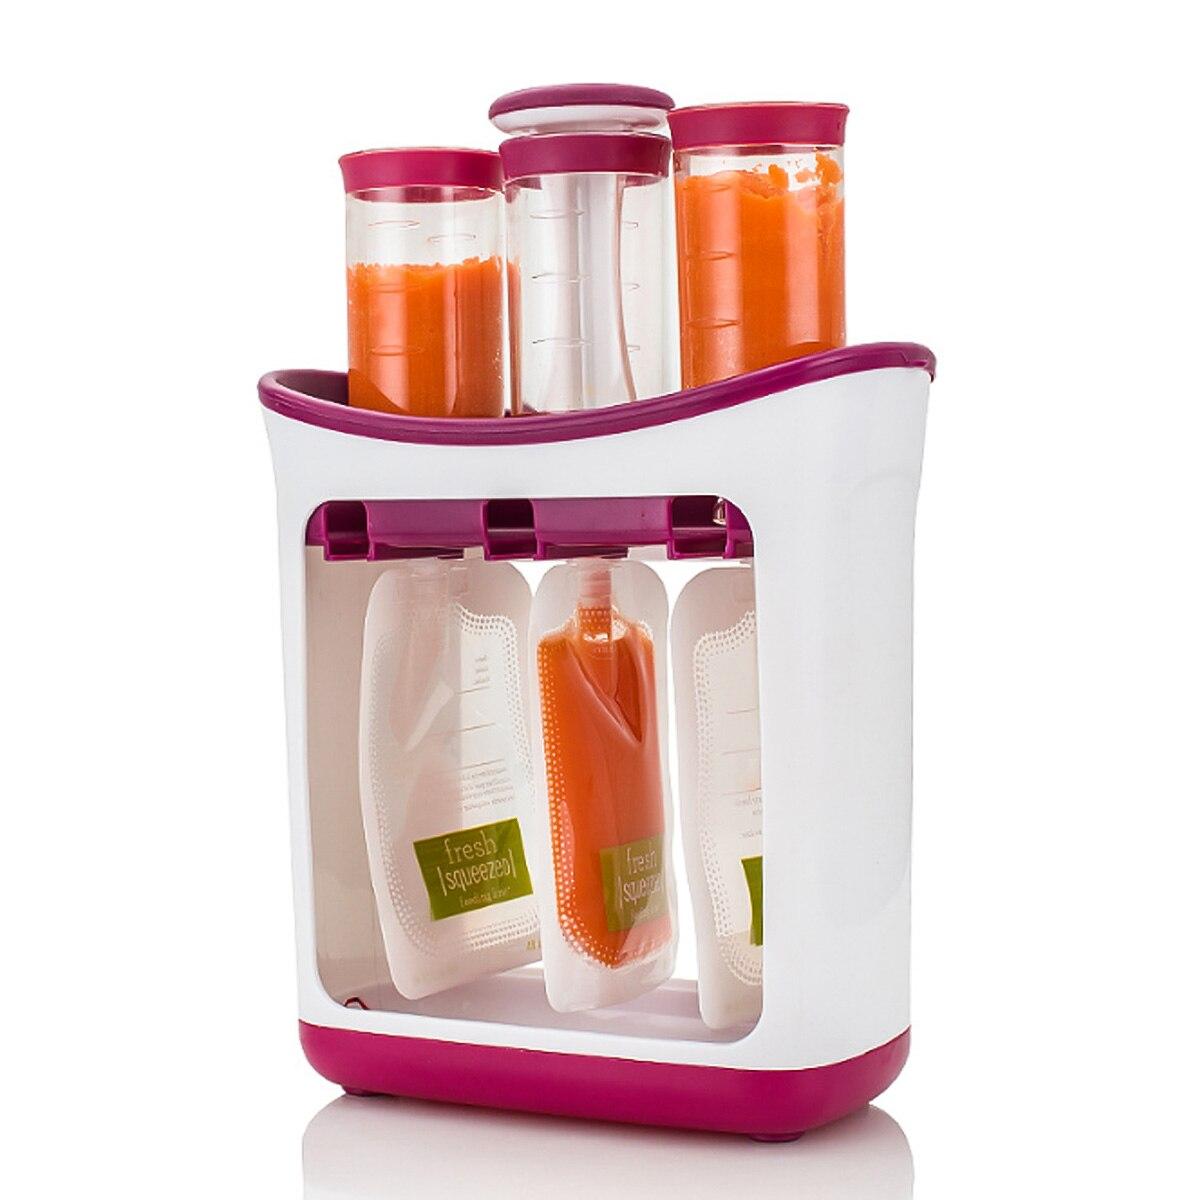 Portable Electric Juicer Blender Fruit Baby Food Milkshake Mixer Meat Grinder Multifunction Juice Maker Machine